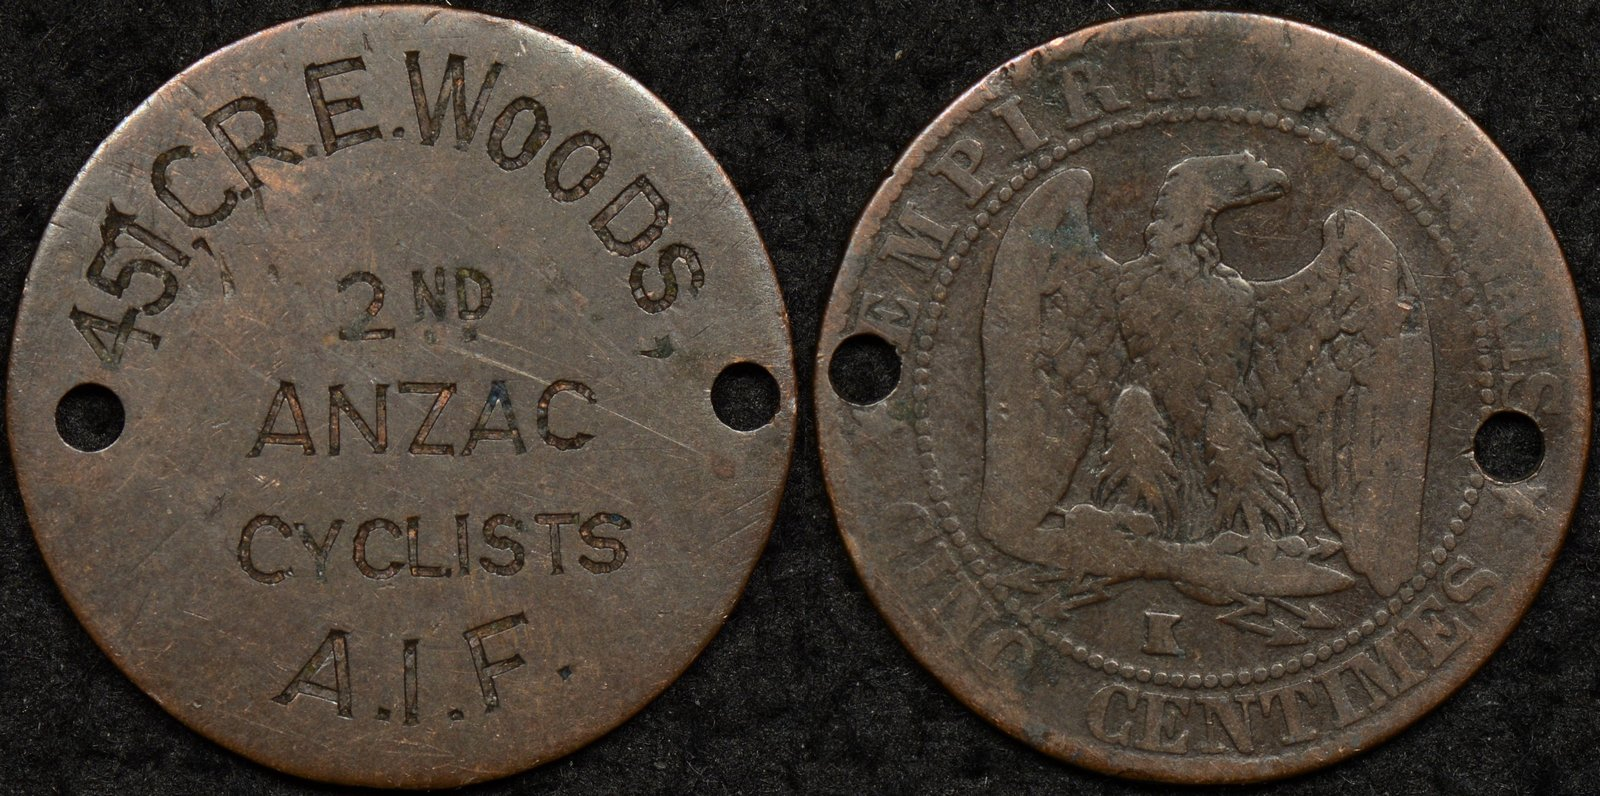 Australian World War 1 Identity Disk – C.R.E Woods 457